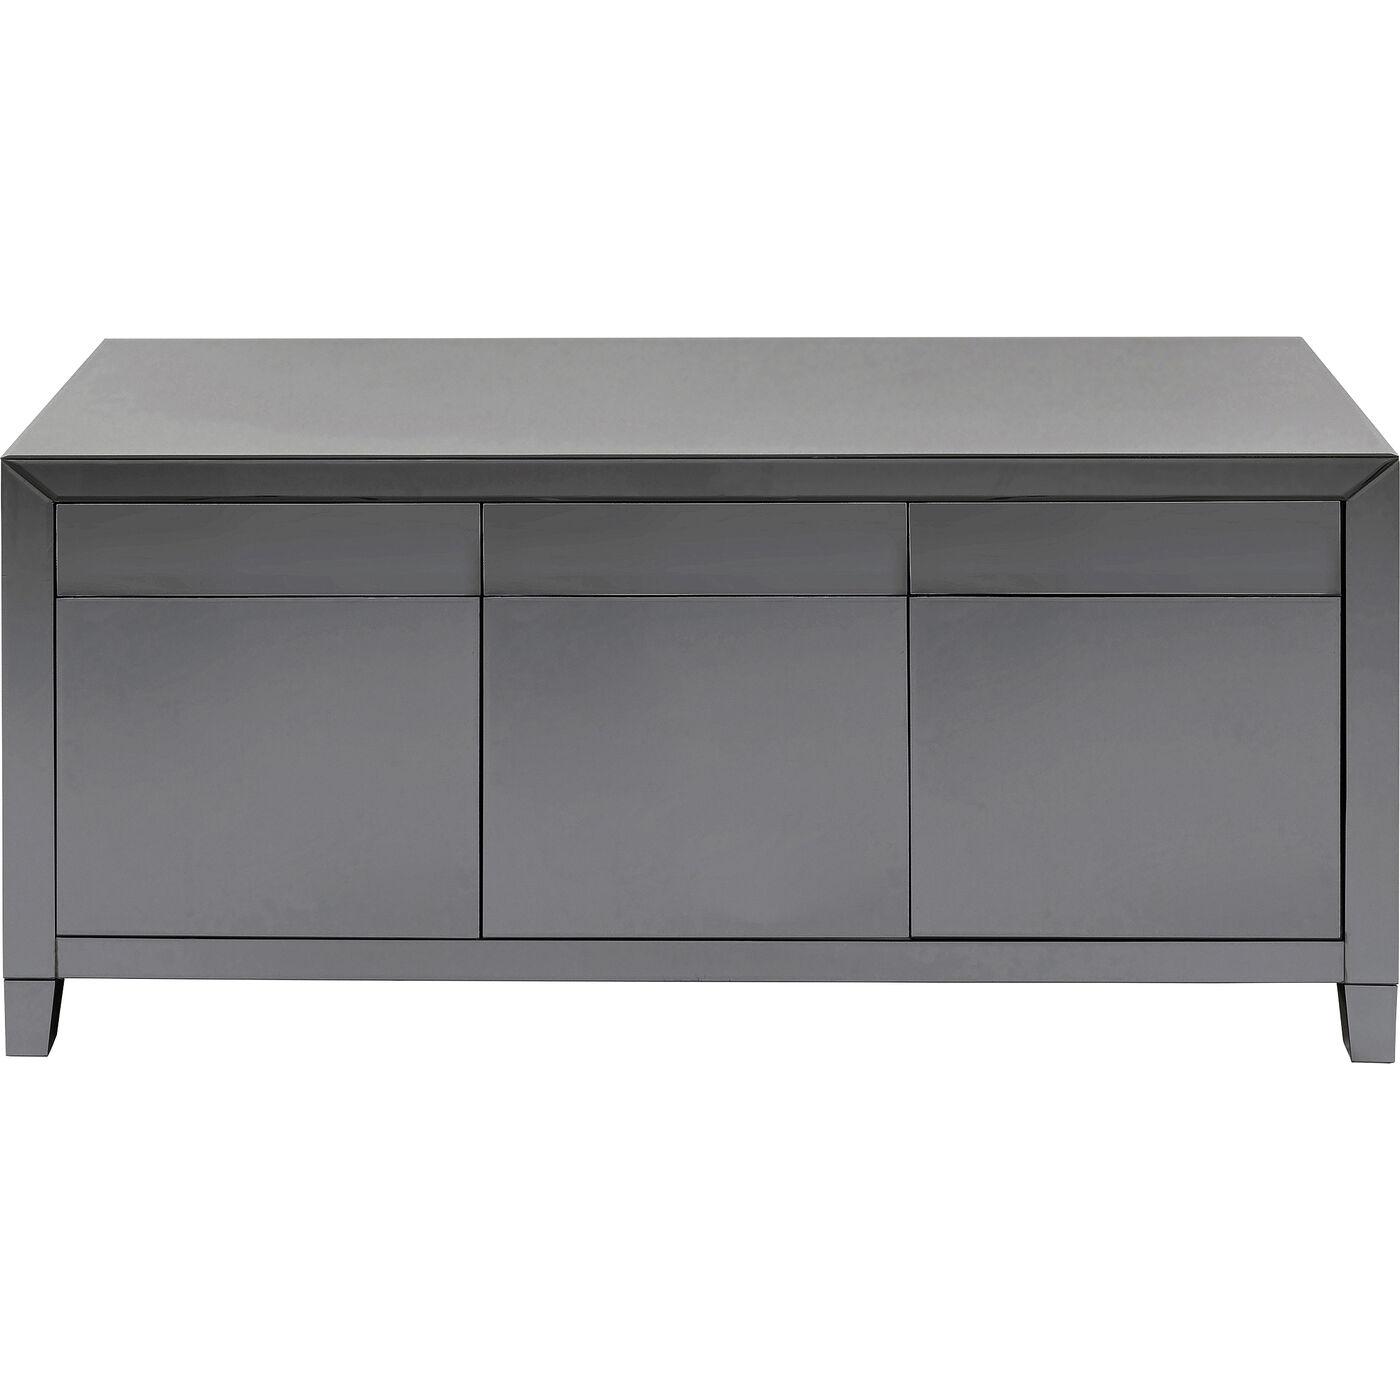 Sideboard Luxury Push Grau